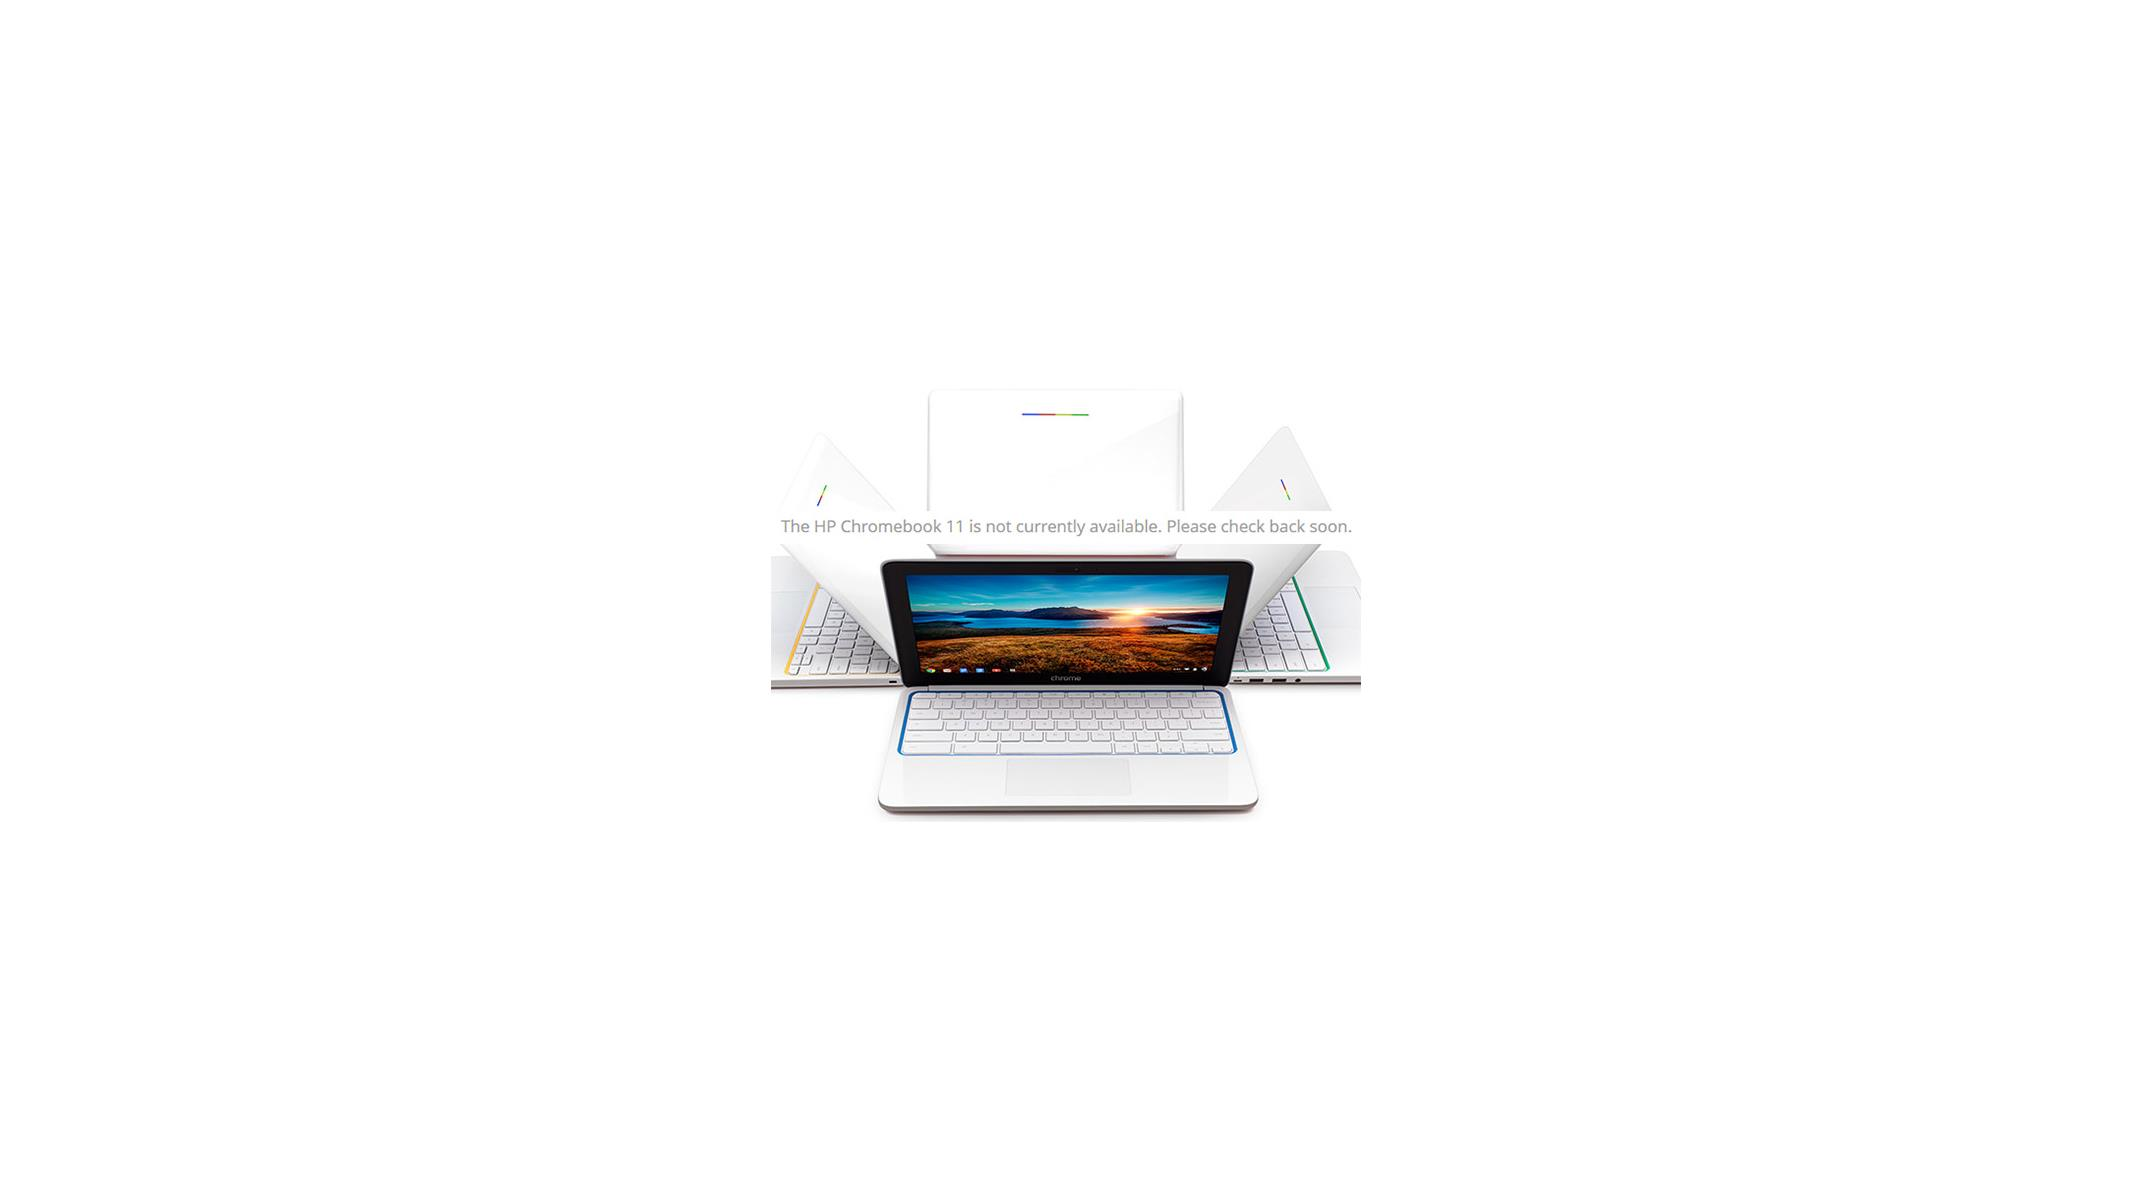 Fire Hazard: HP, Google Officially Recall HP Chromebook 11 Charger